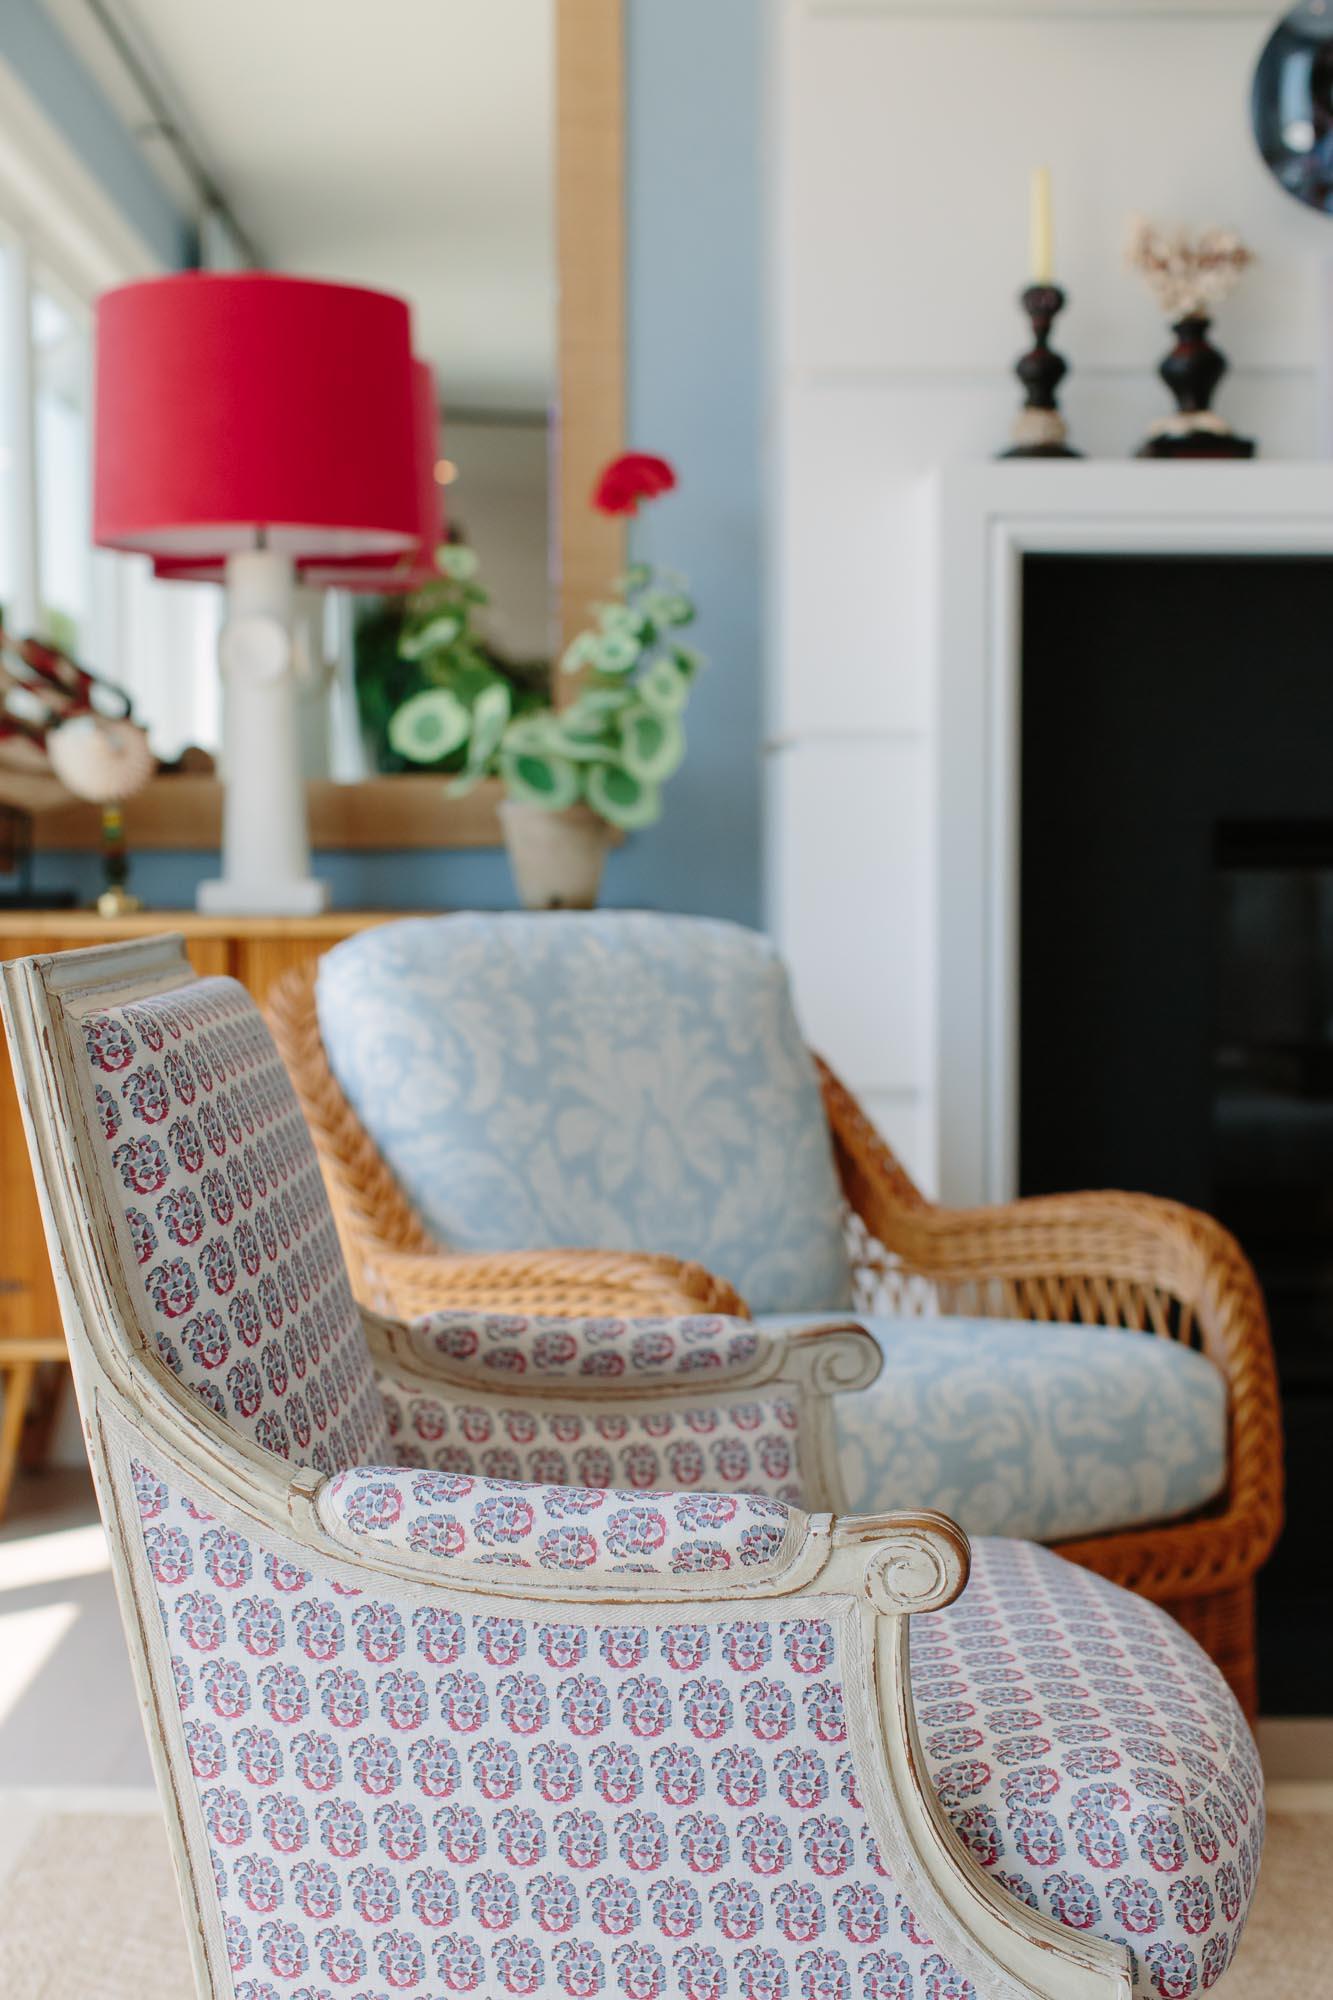 Alessandra Branca living room at the 2019 Hampton Designer Showhouse